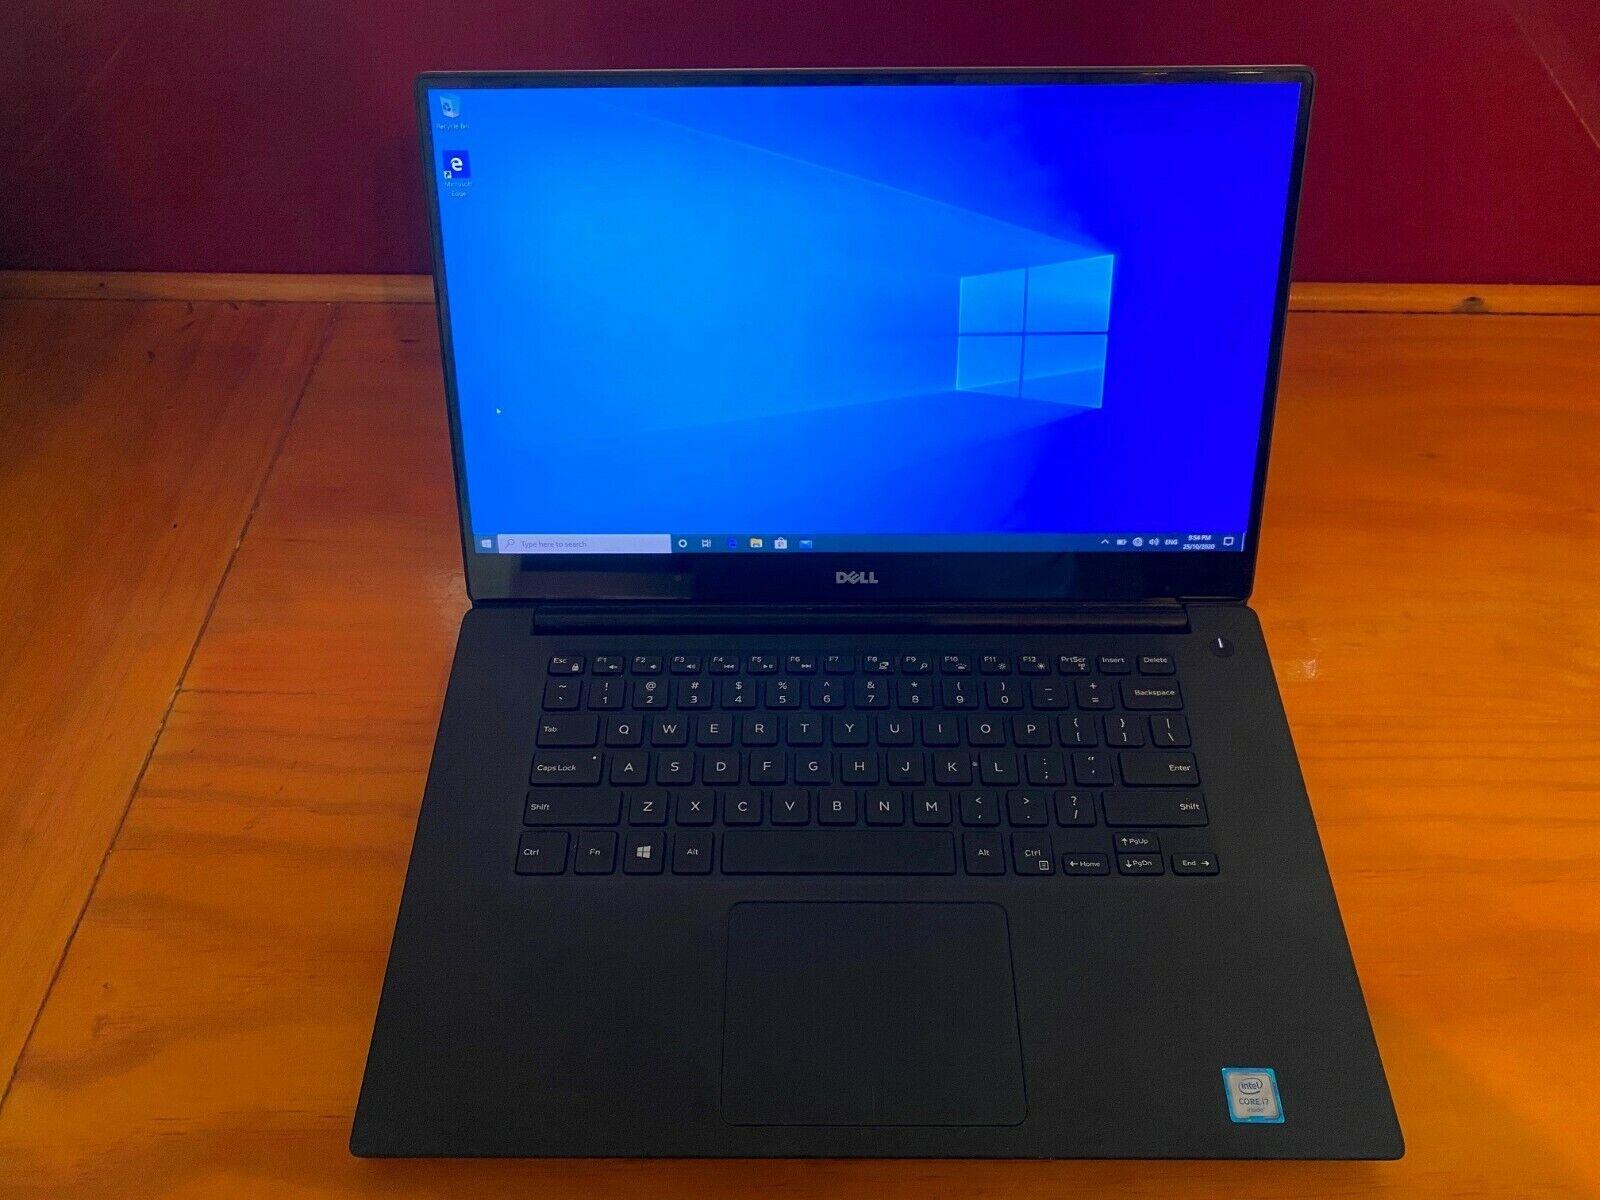 Laptop Windows - Dell Precision 5510, 16gb RAM, 4k UHD Touchscreen, Windows 10 Pro